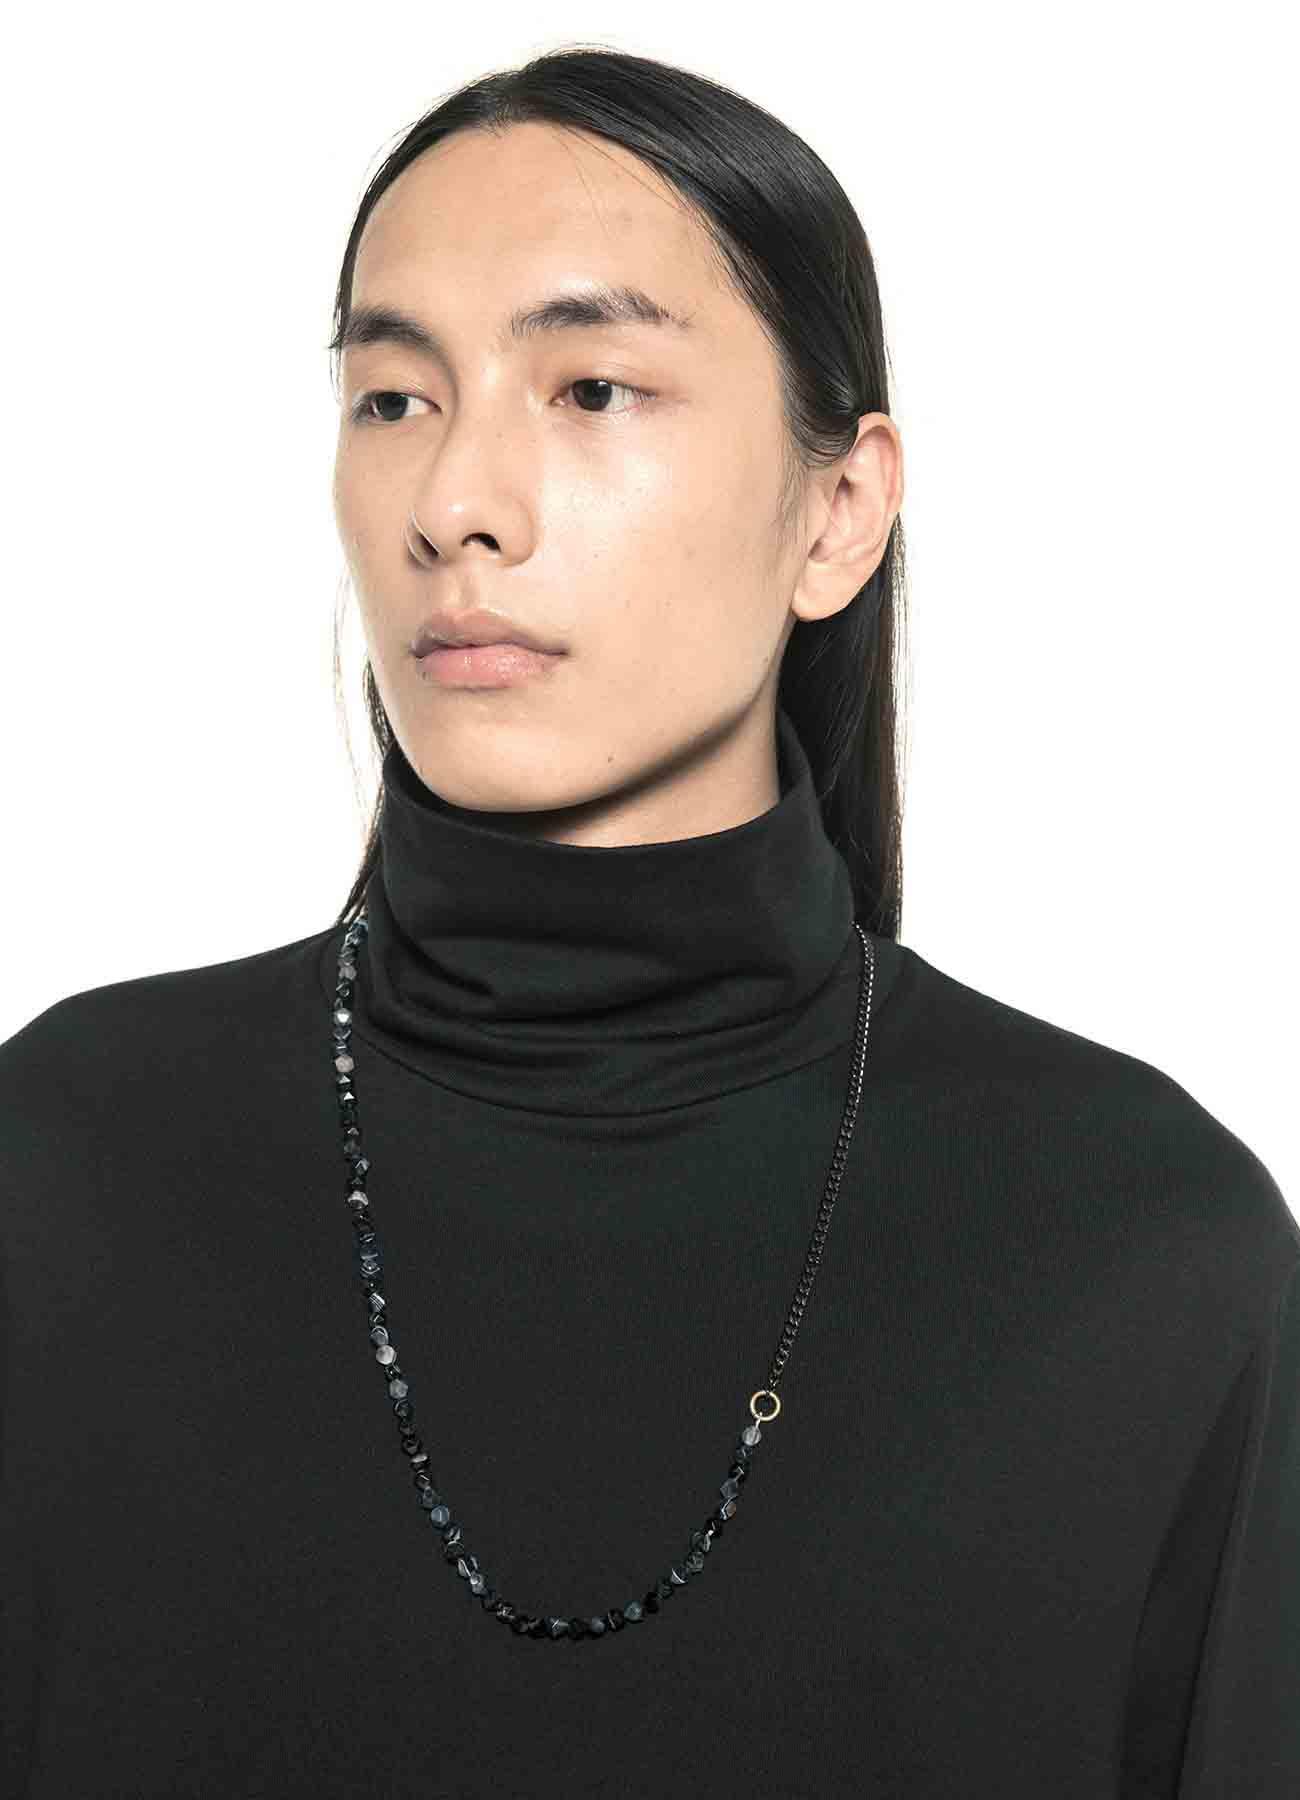 Onyx Brass Chain Necklace Bracelet